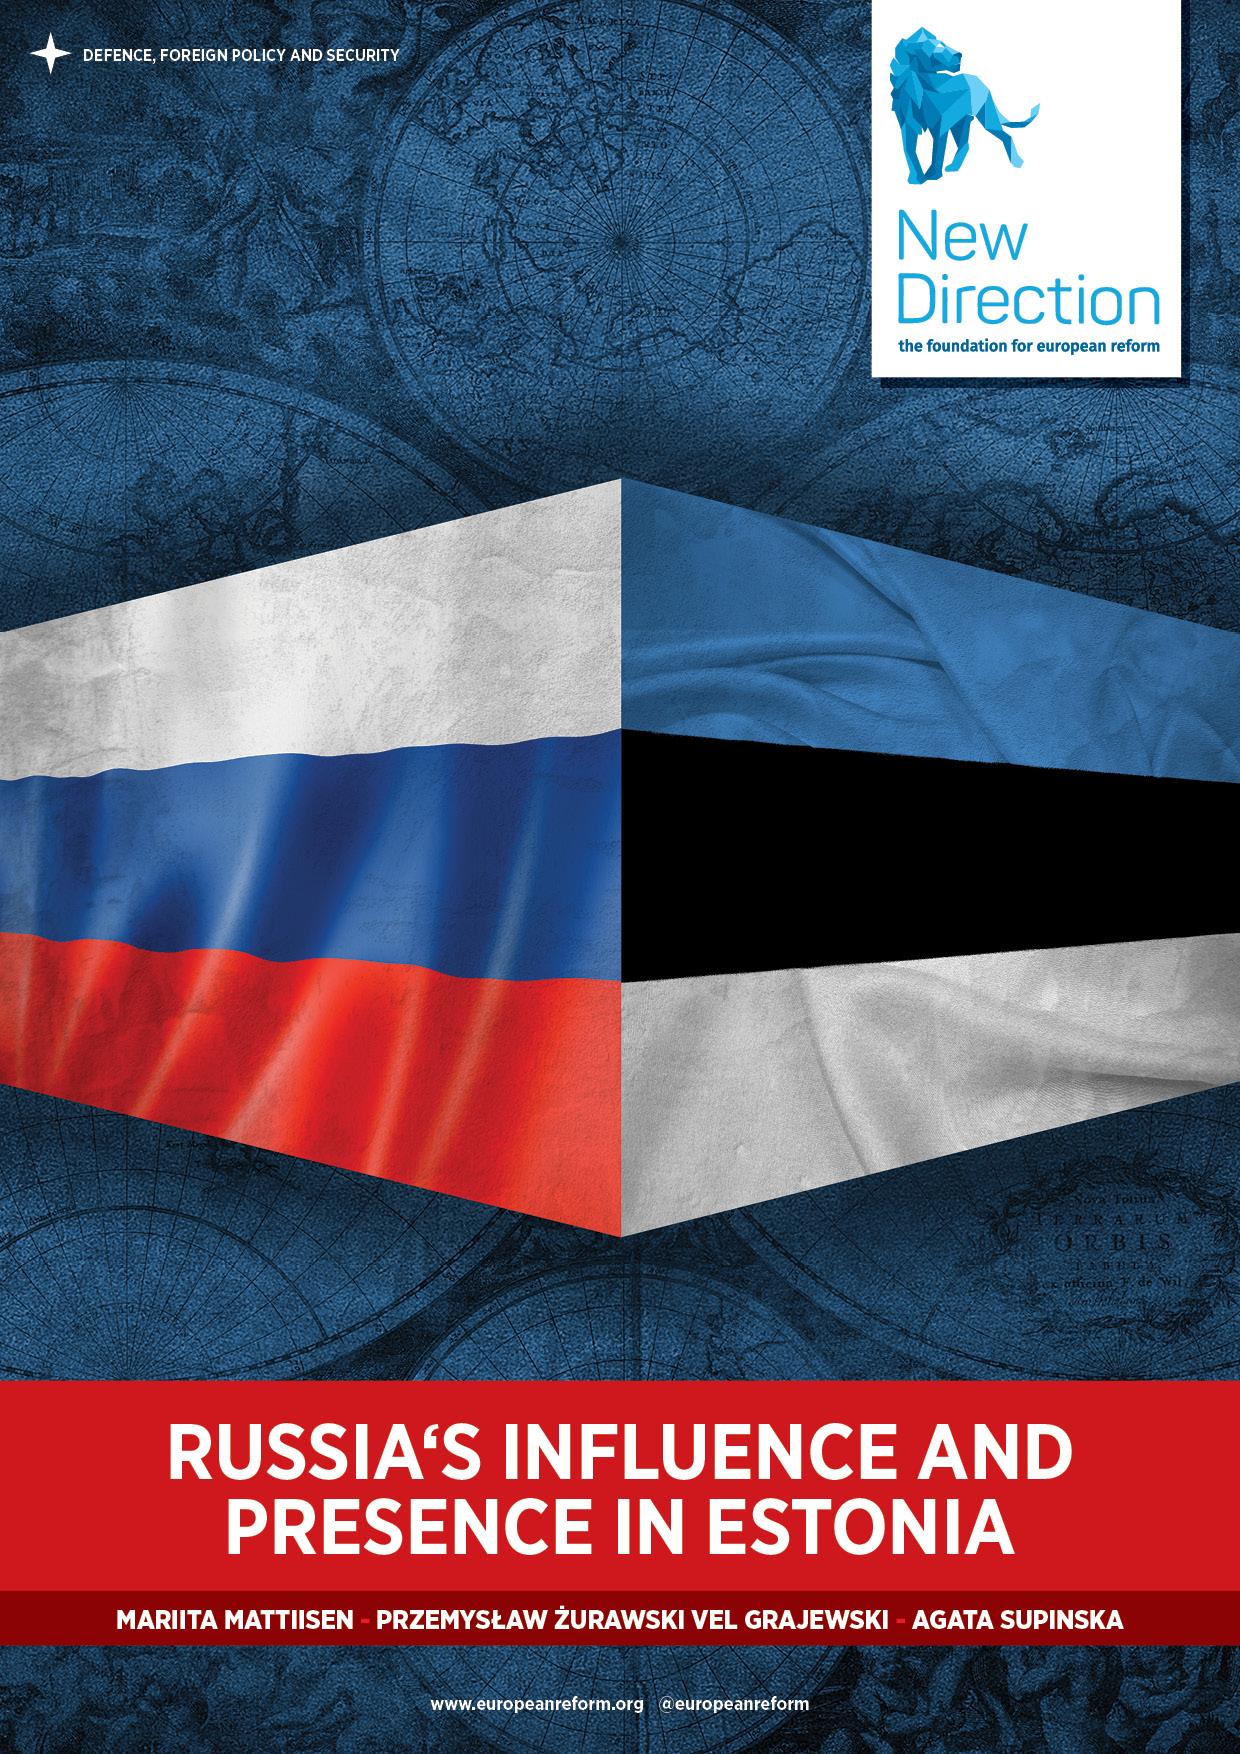 Russia's influence and presence in Estonia